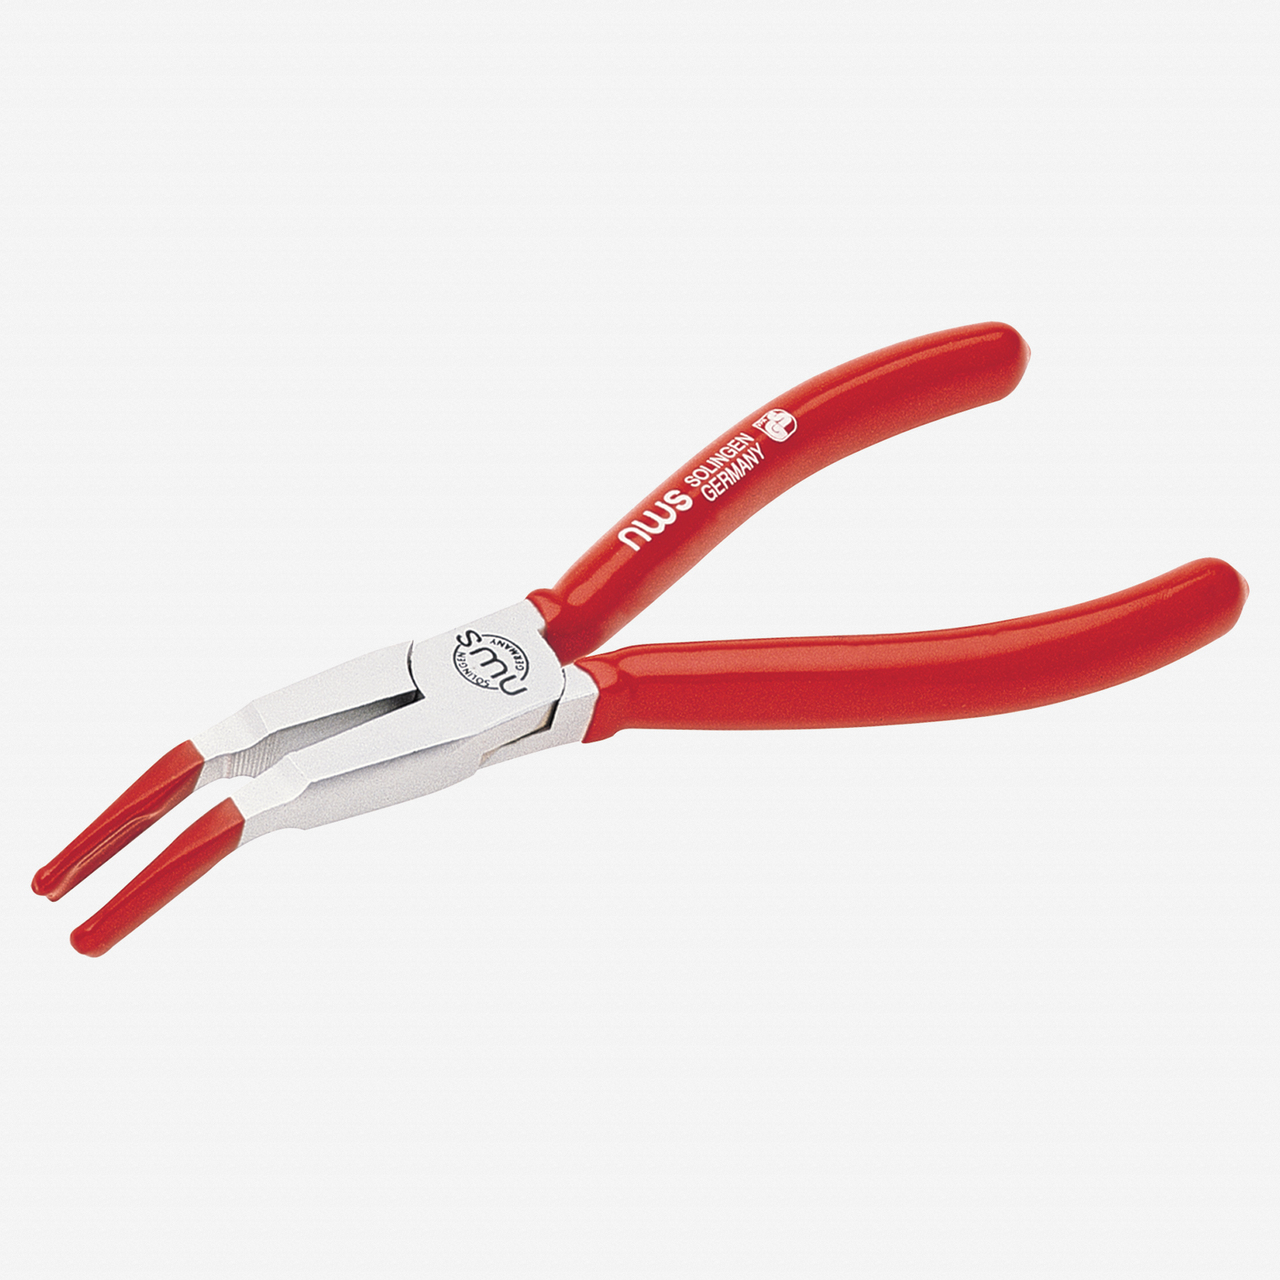 "NWS 487-42-160 6.25"" Pliers for electric light bulbs - Atramentized - Plastic Grip - KC Tool"